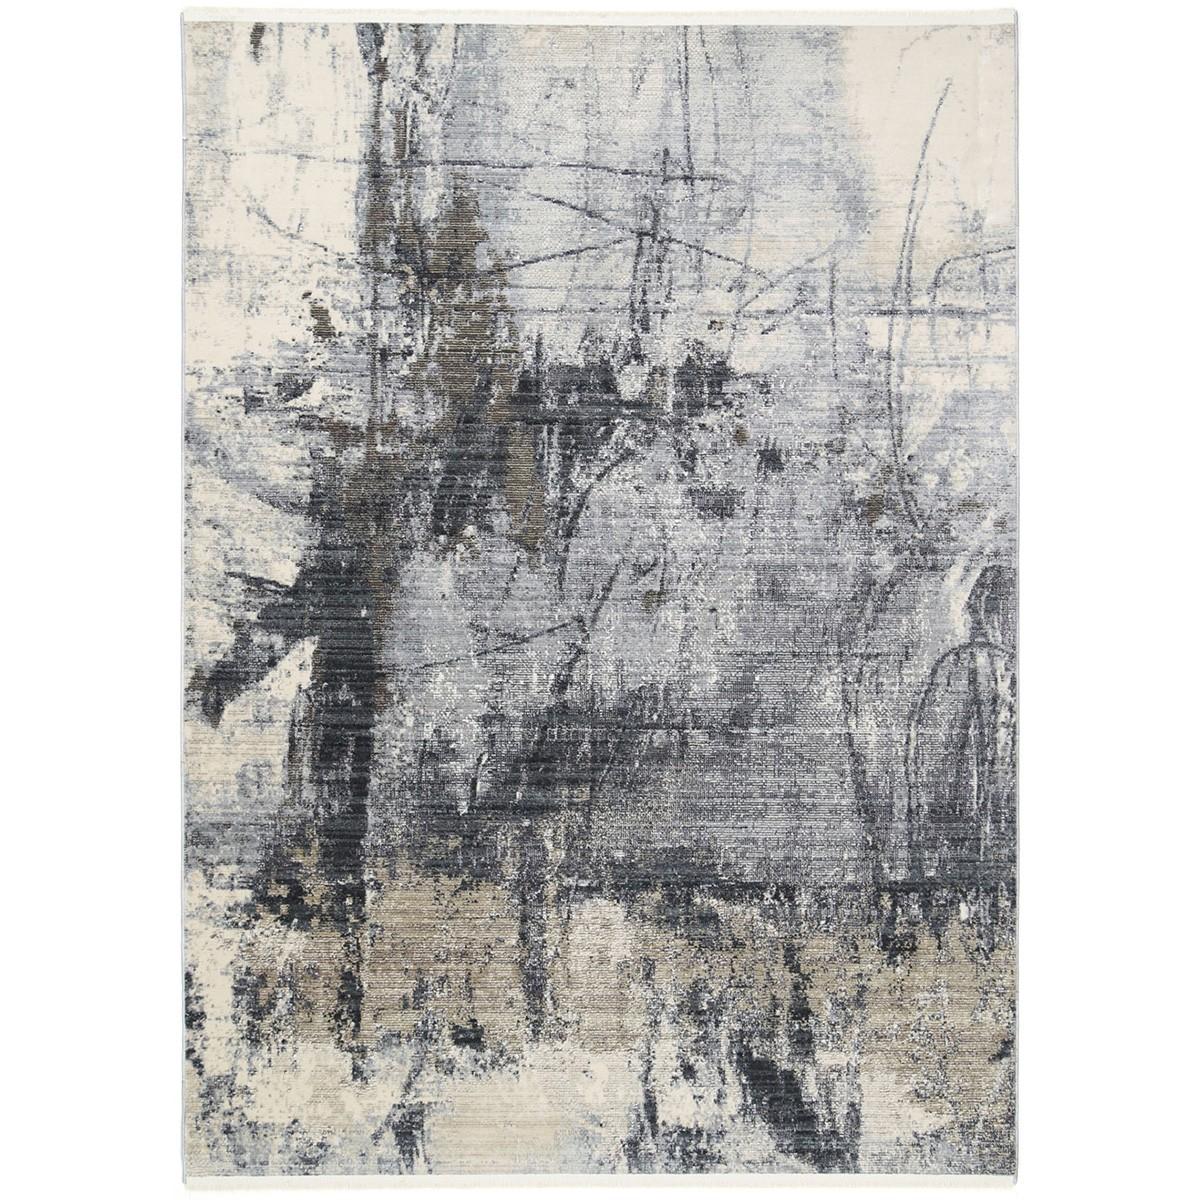 Dragos Abstract Modern Rug, 330x240cm, Cream / Grey